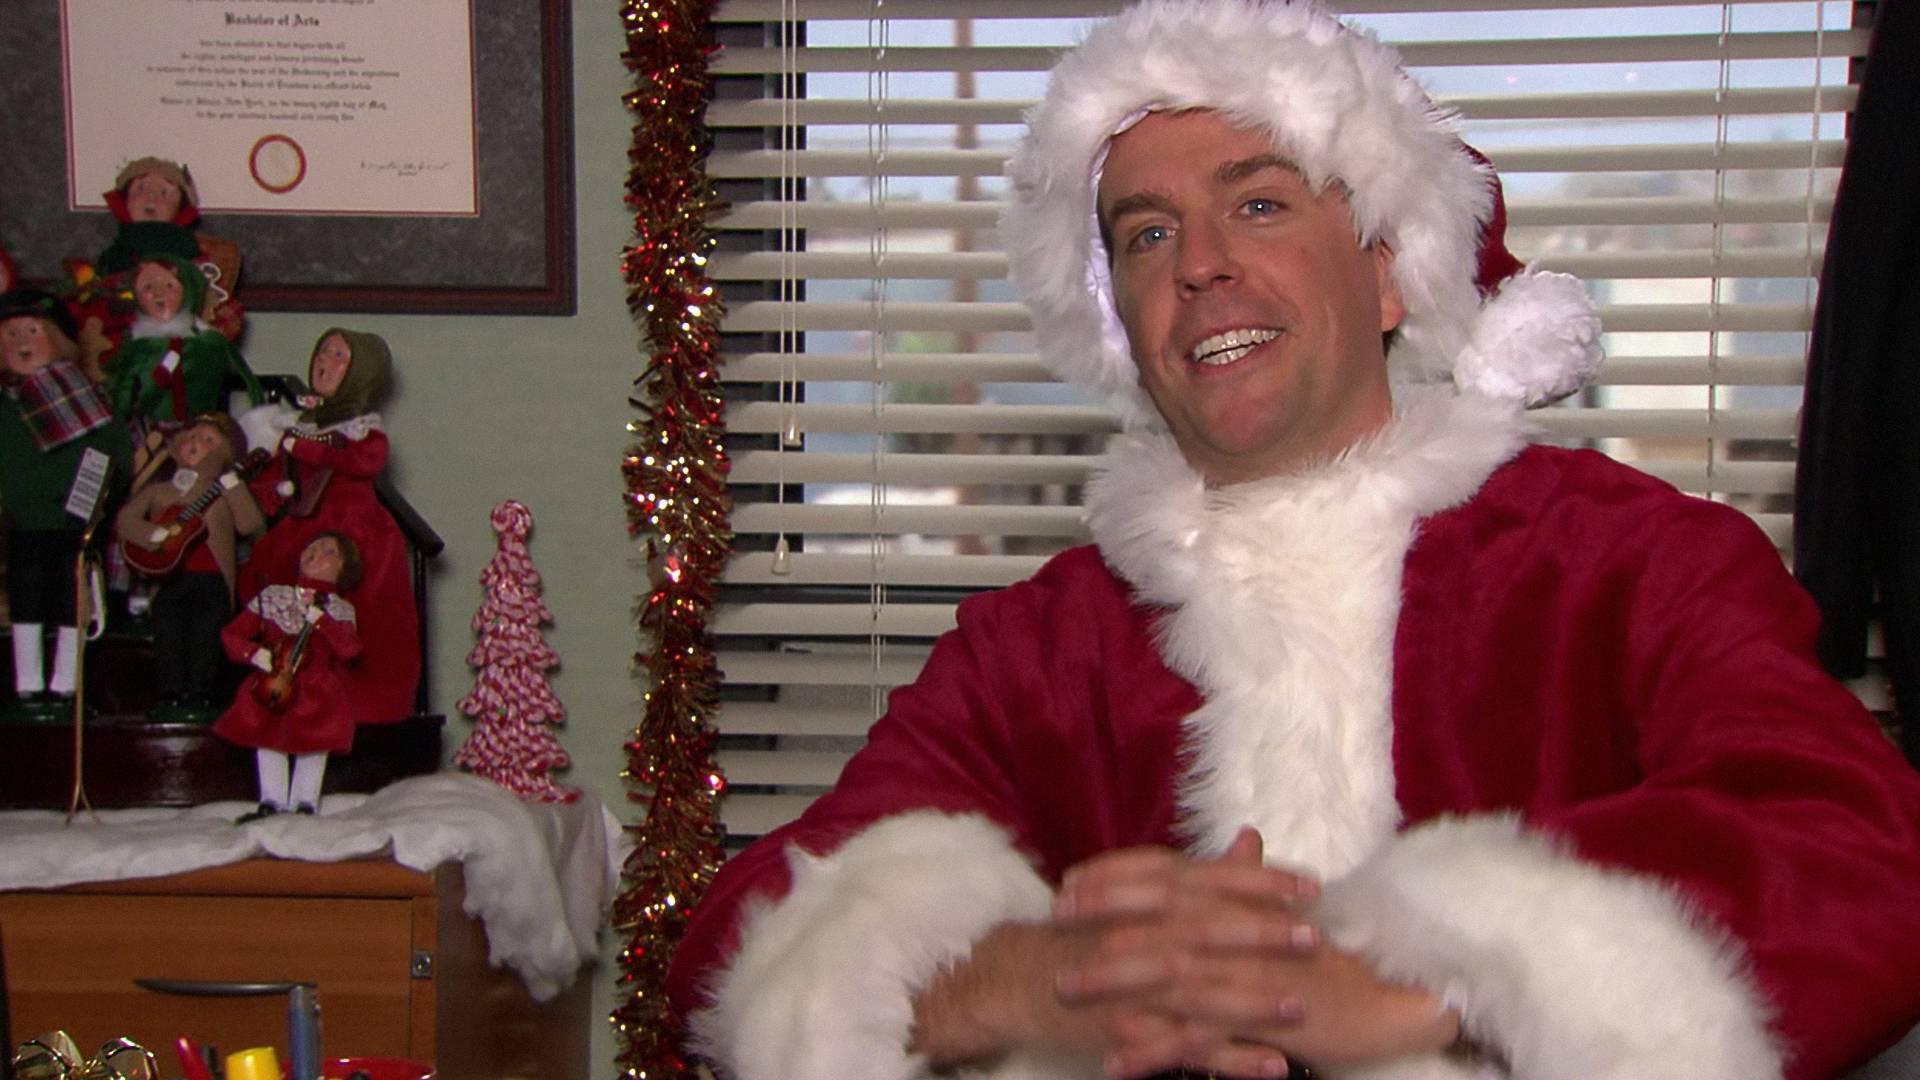 The Office Season 8 Episode 10